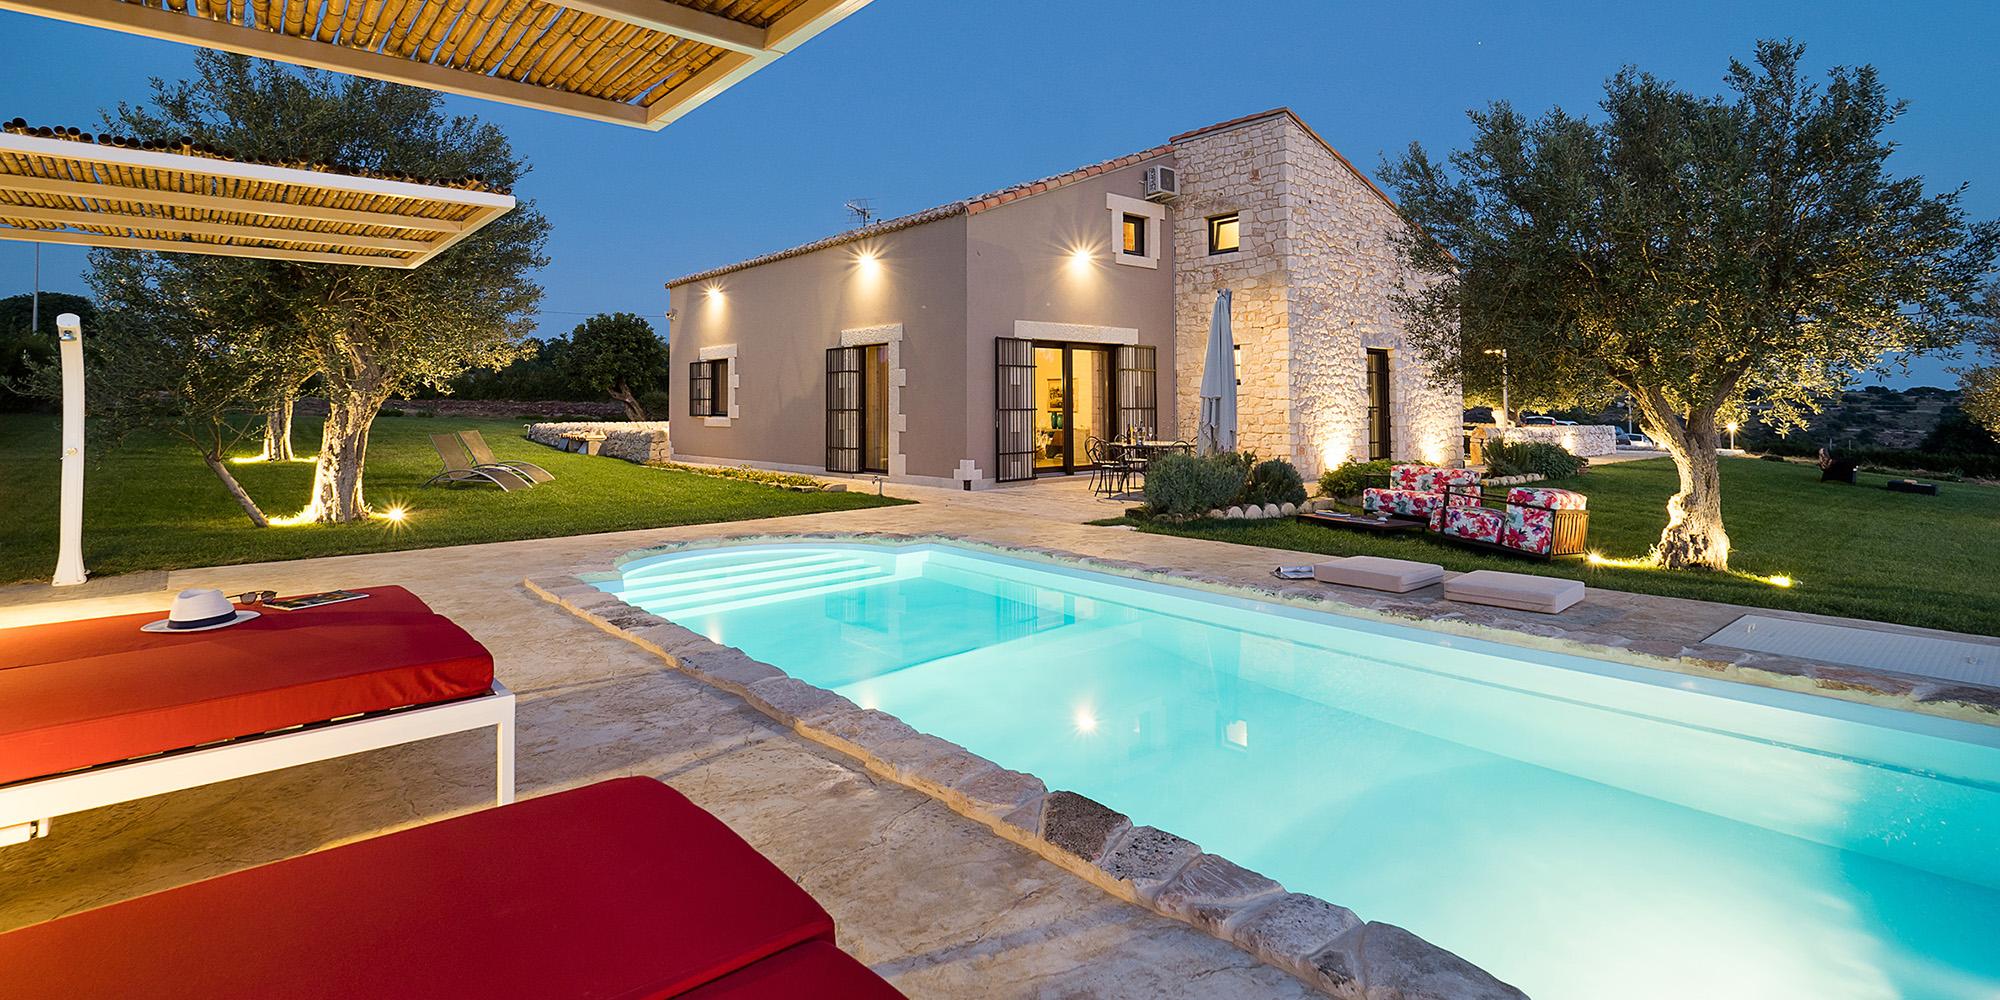 Casale Balate: accommodation in Ragusa Sicily